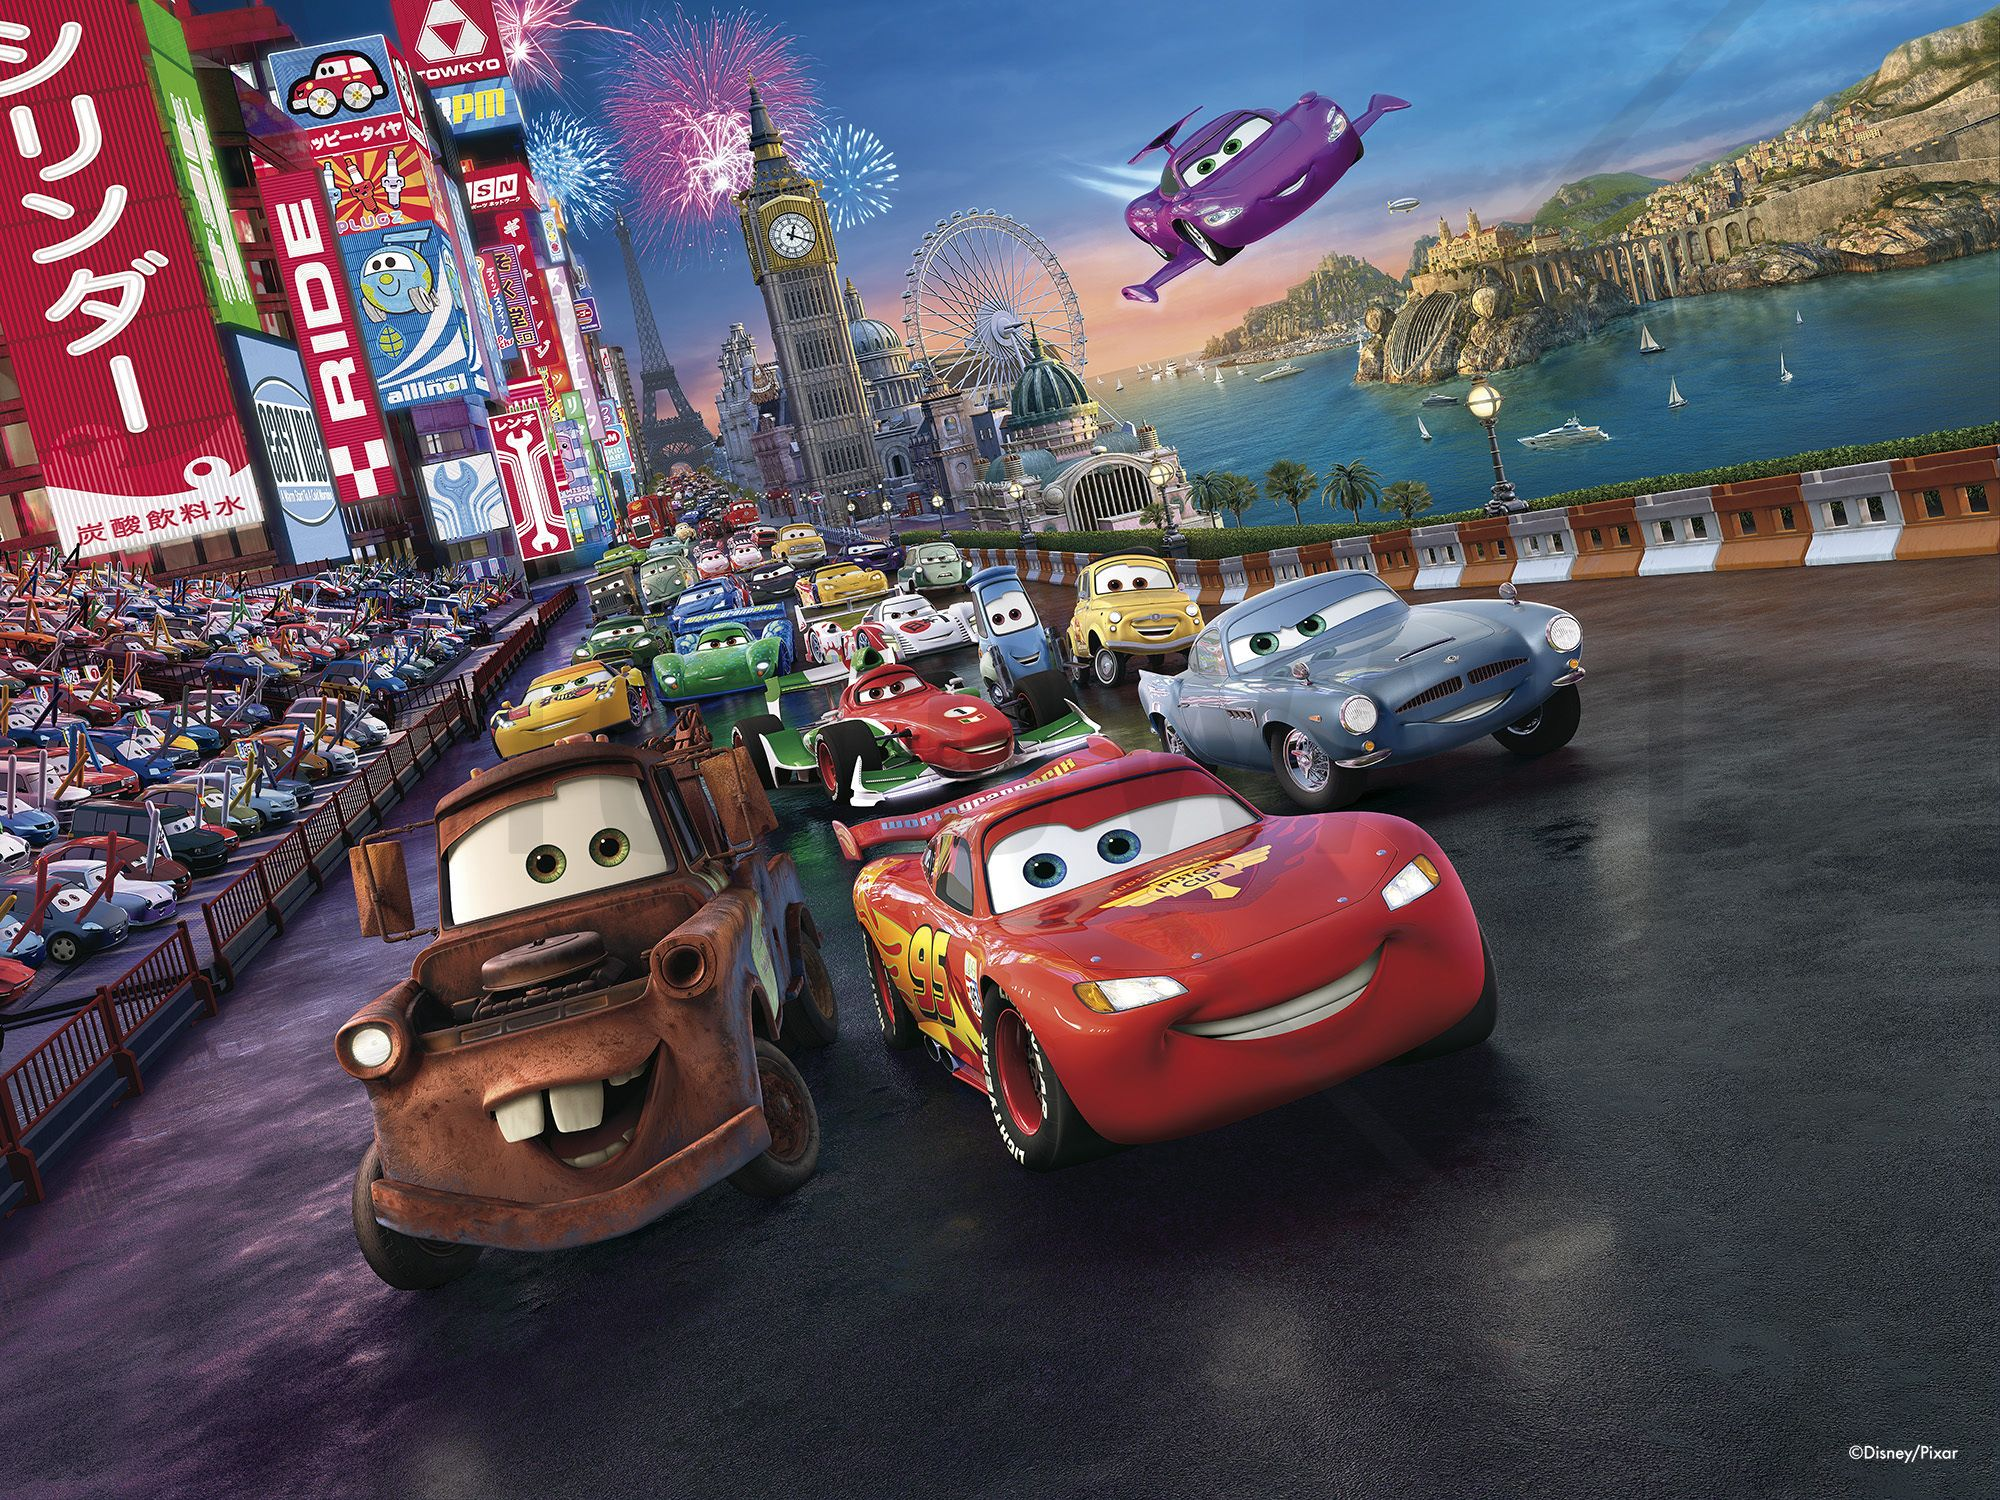 Disney Cars Wall Murals & Wallpapers Photowall.co.uk